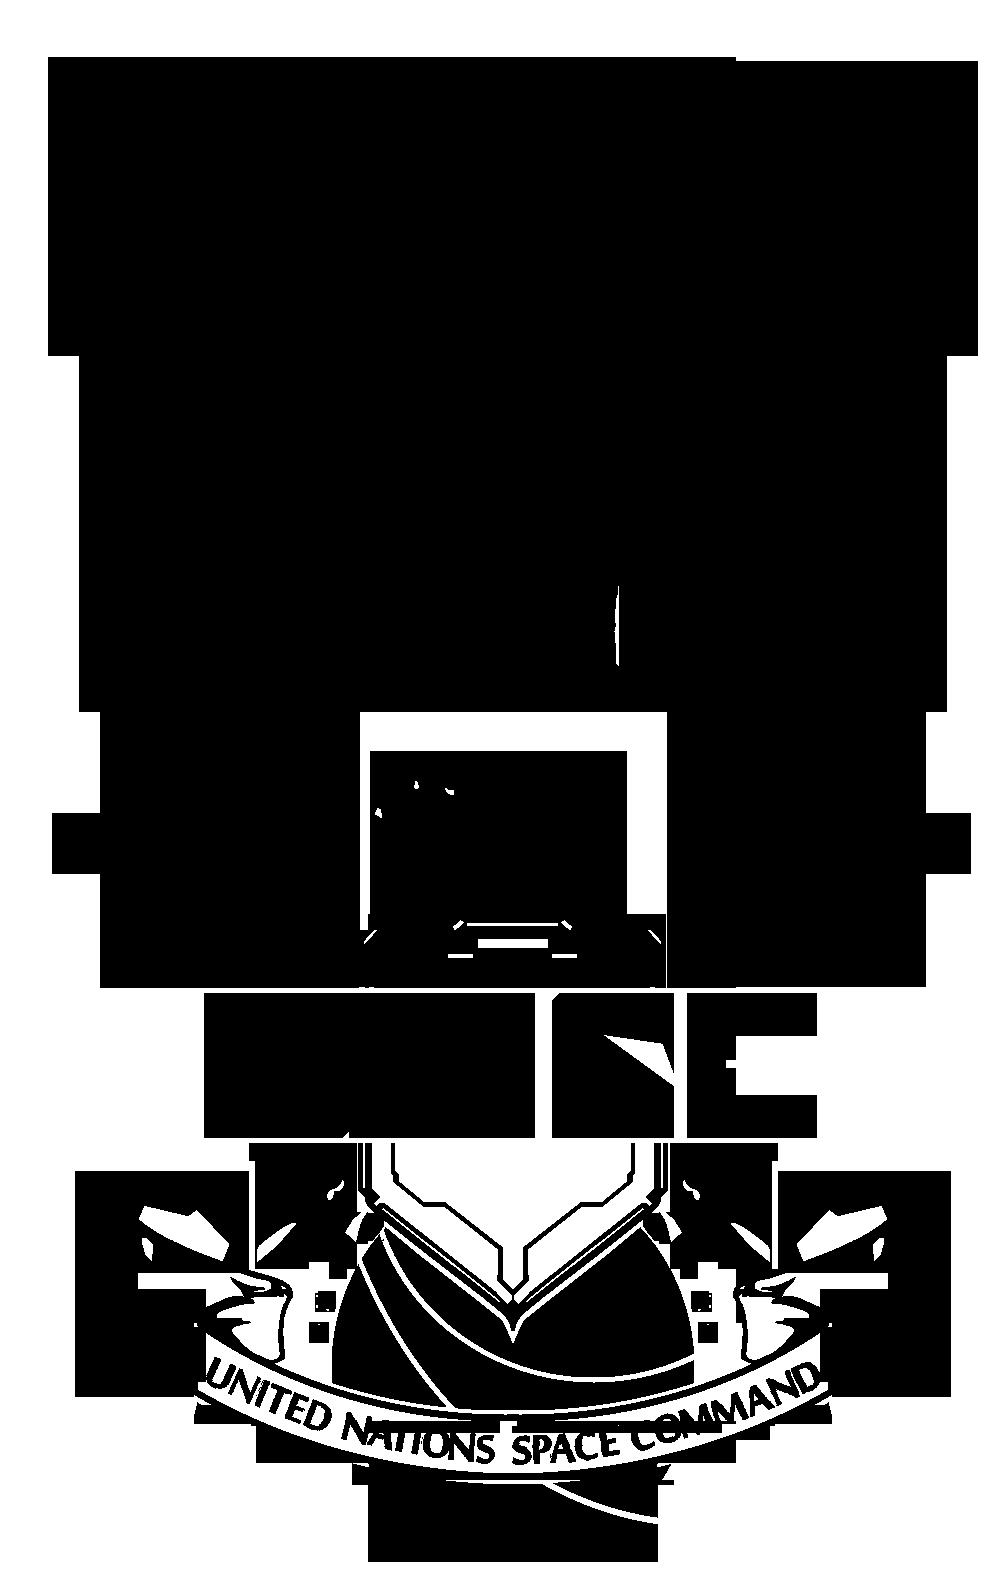 imagen unsc logo halo 4 png halopedia fandom powered by wikia